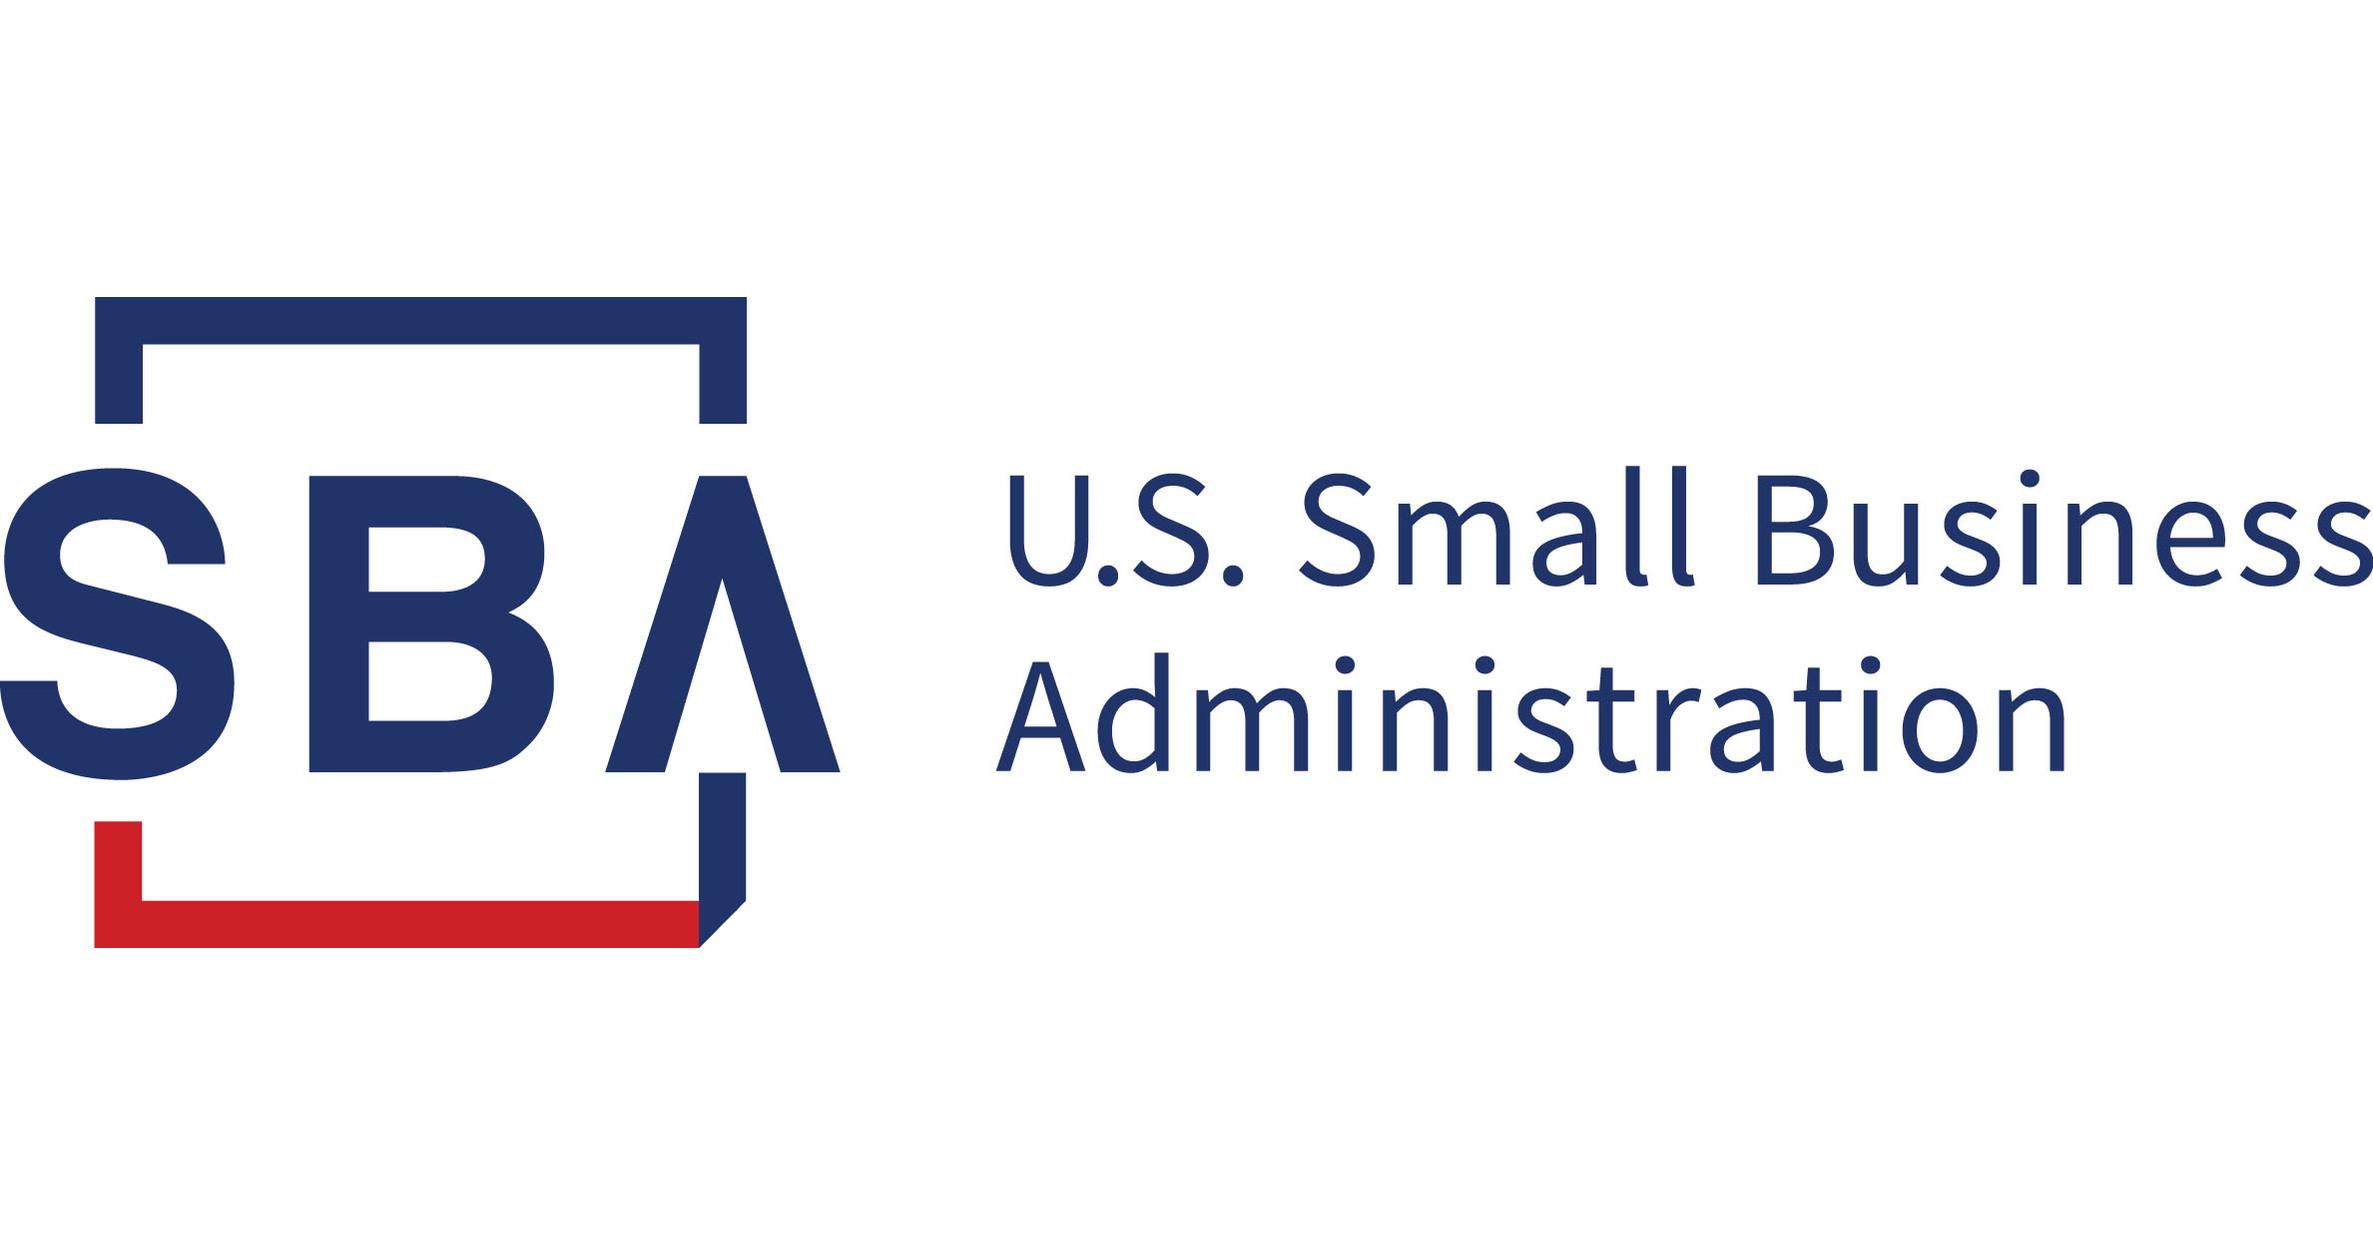 u_s__small_business_administration_logo.